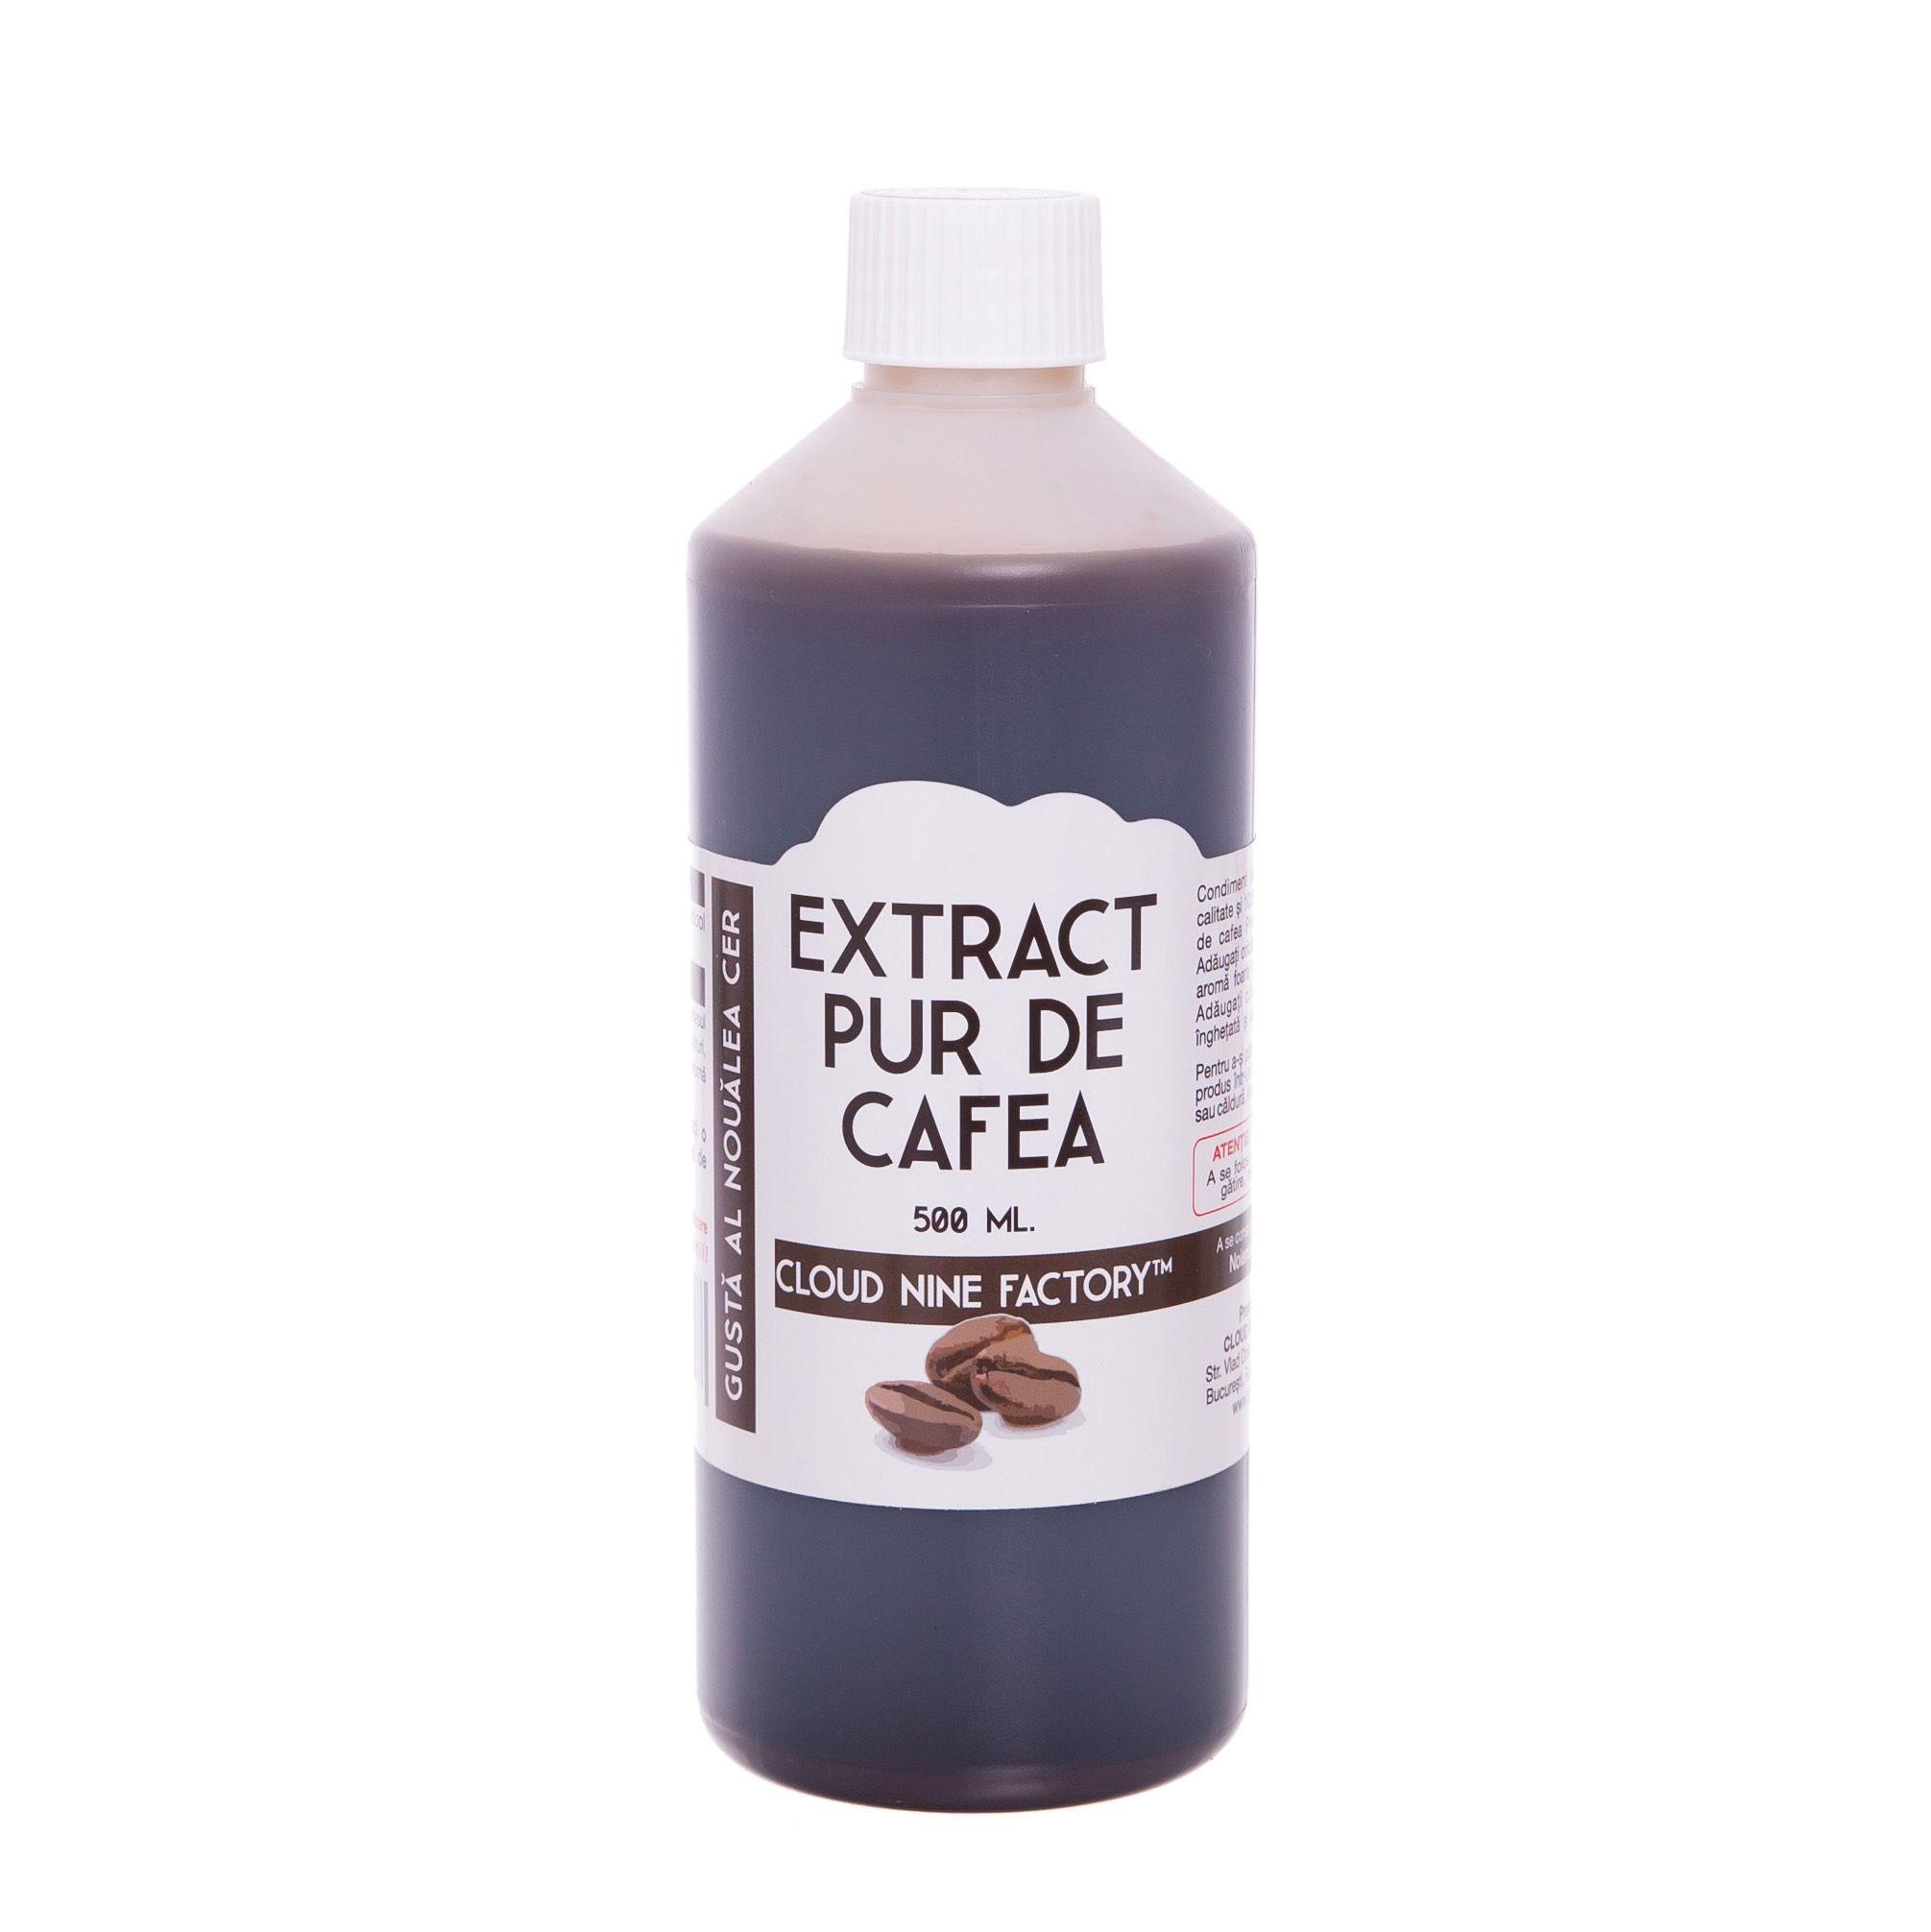 Extract Pur de Cafea (500 ml.) Extract Pur de Cafea (500 ml.) - IMG 2635 - Extract Pur de Cafea (500 ml.) Extract Pur de Cafea - IMG 2635 - Extract Pur de Cafea